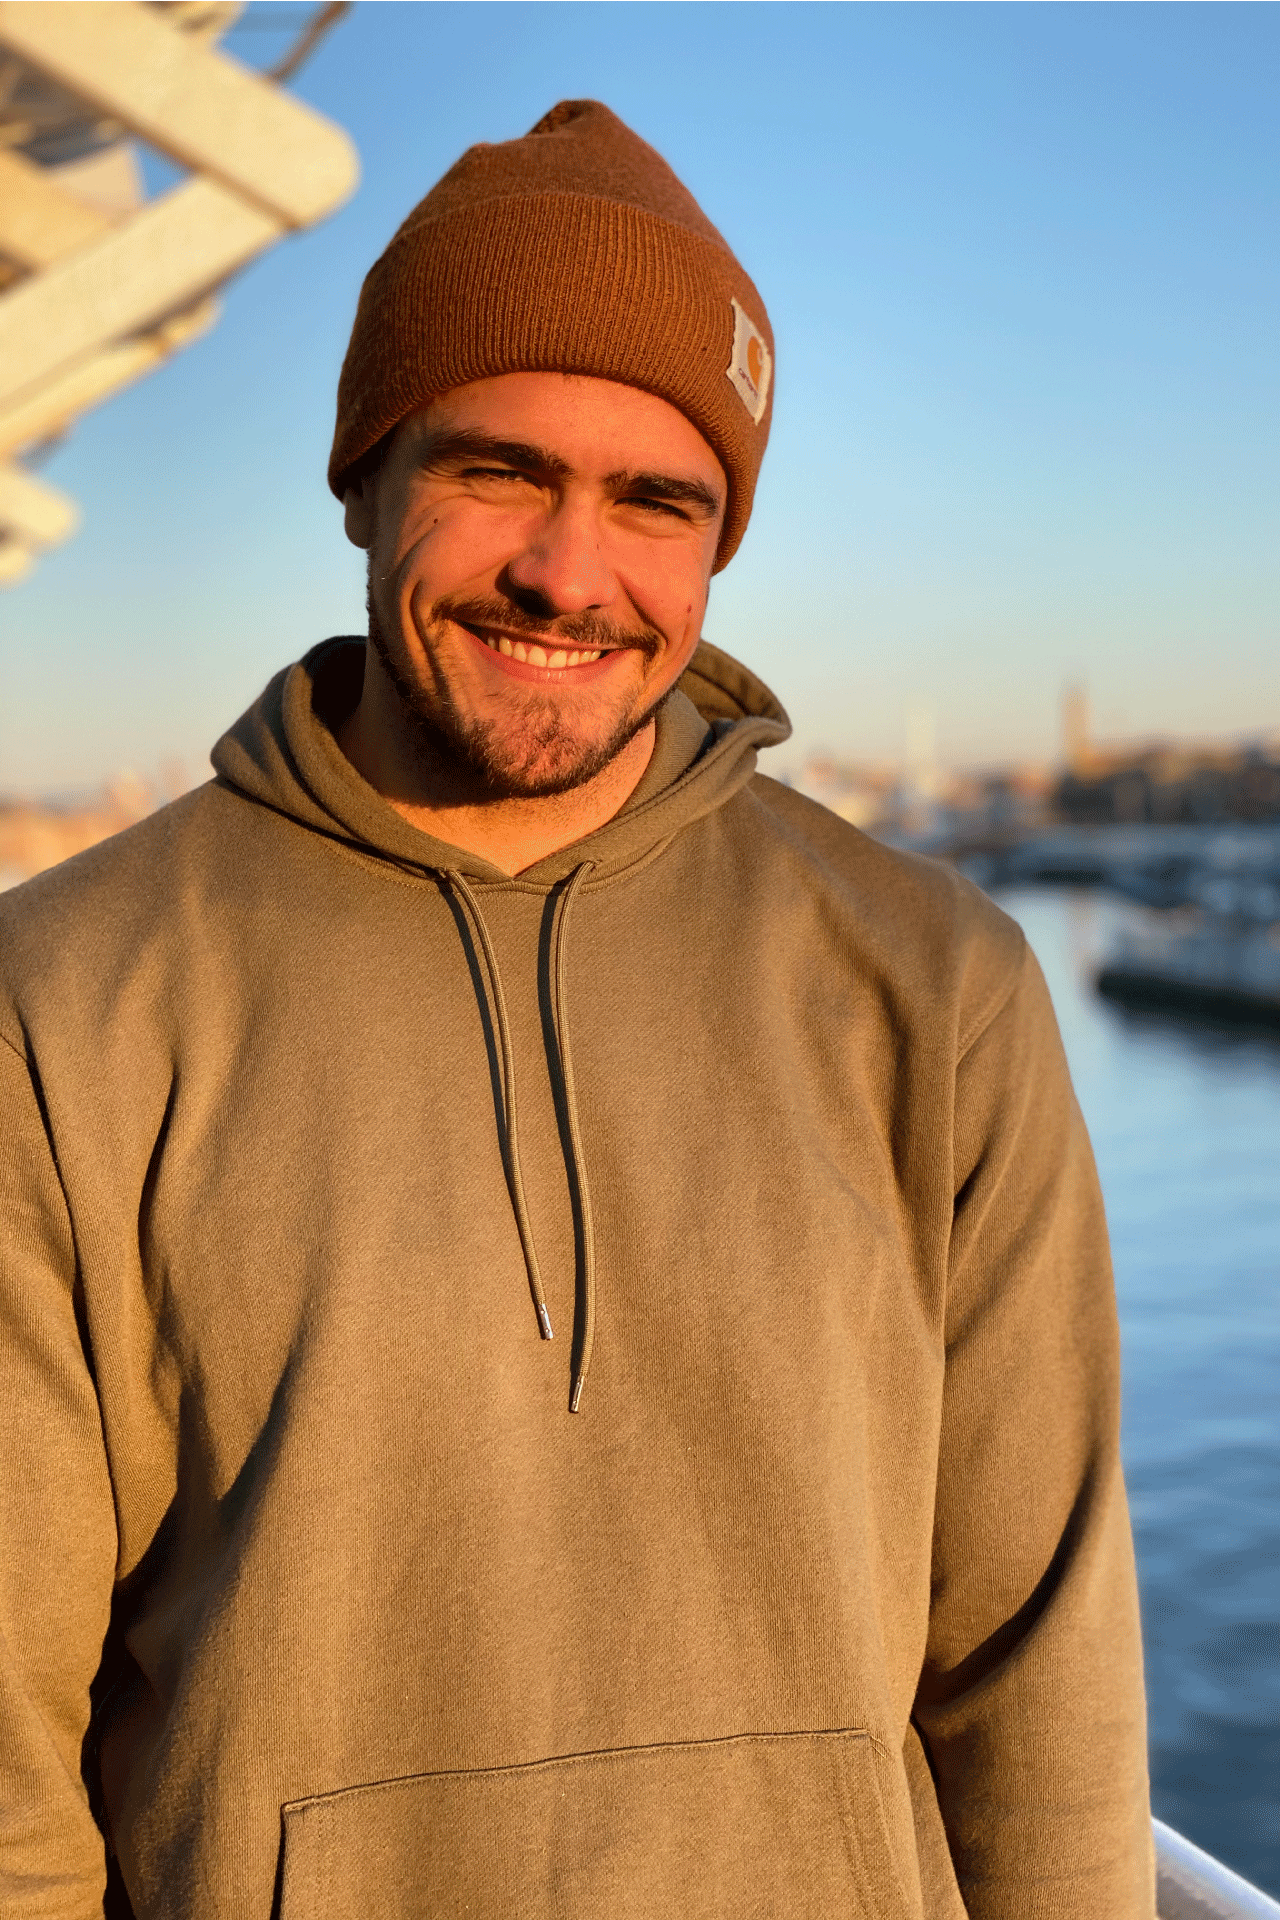 Jon Daniel Edlund